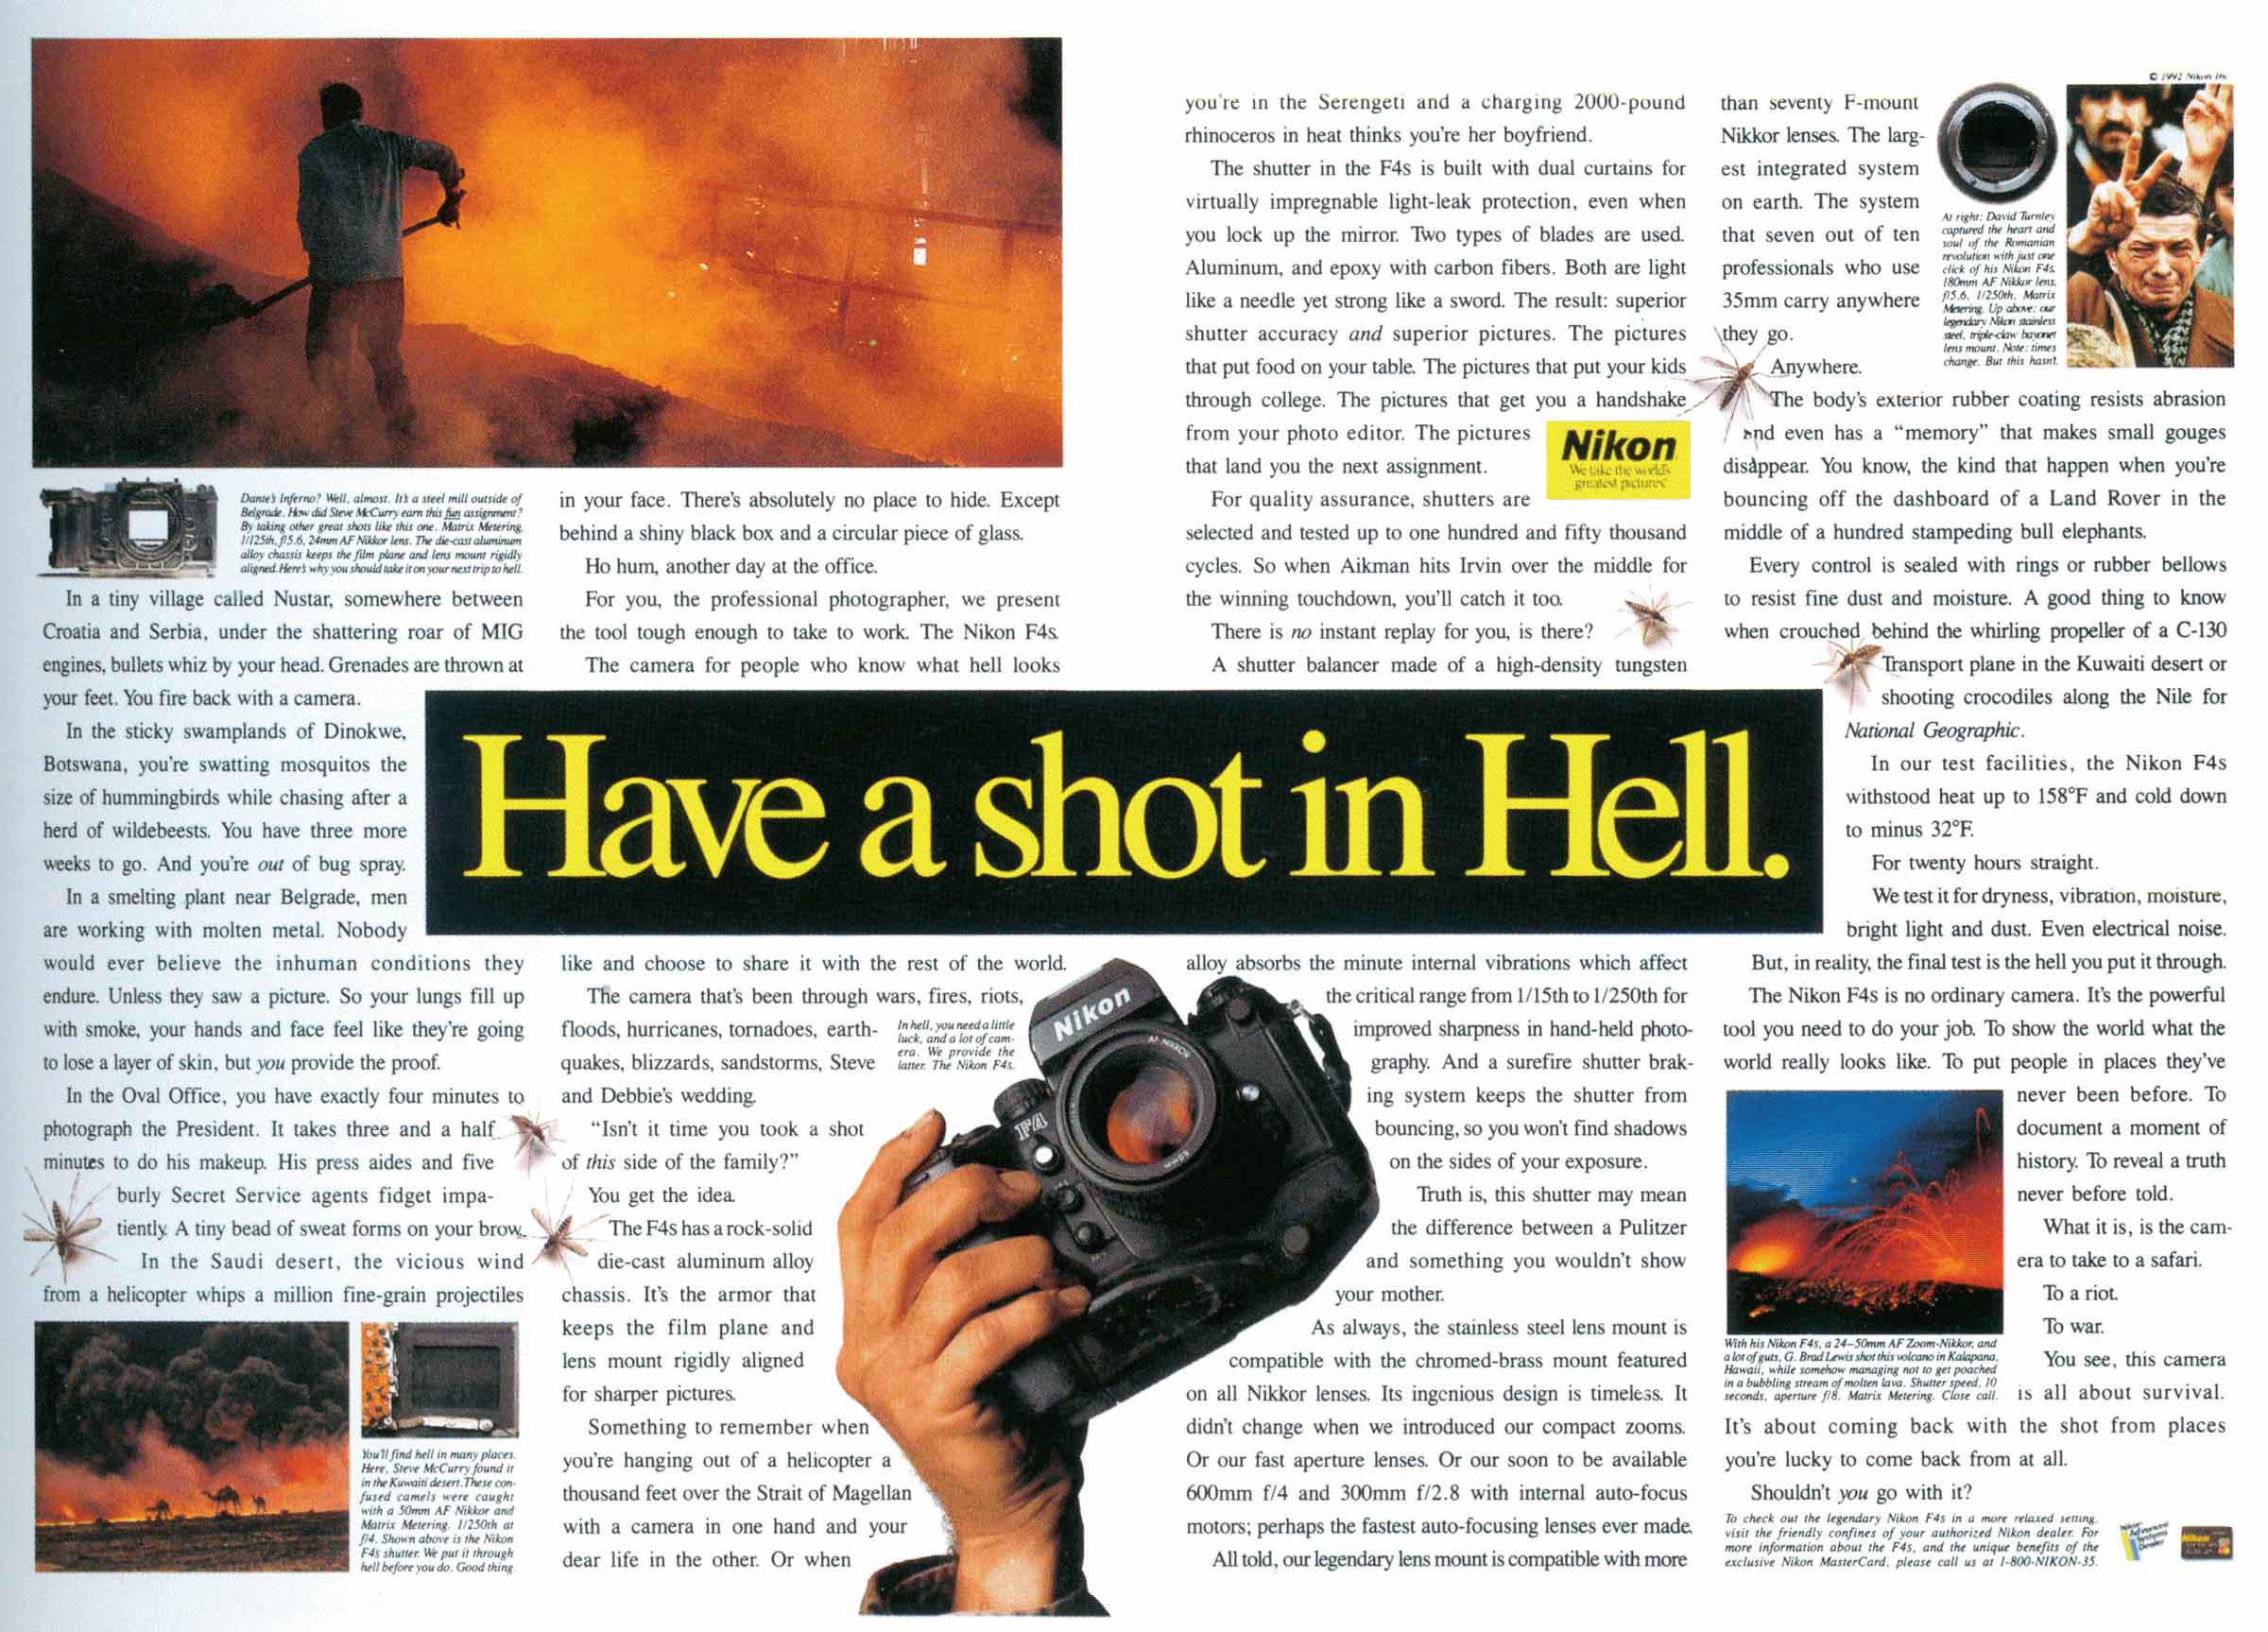 Nikon F4 advertisement 1993